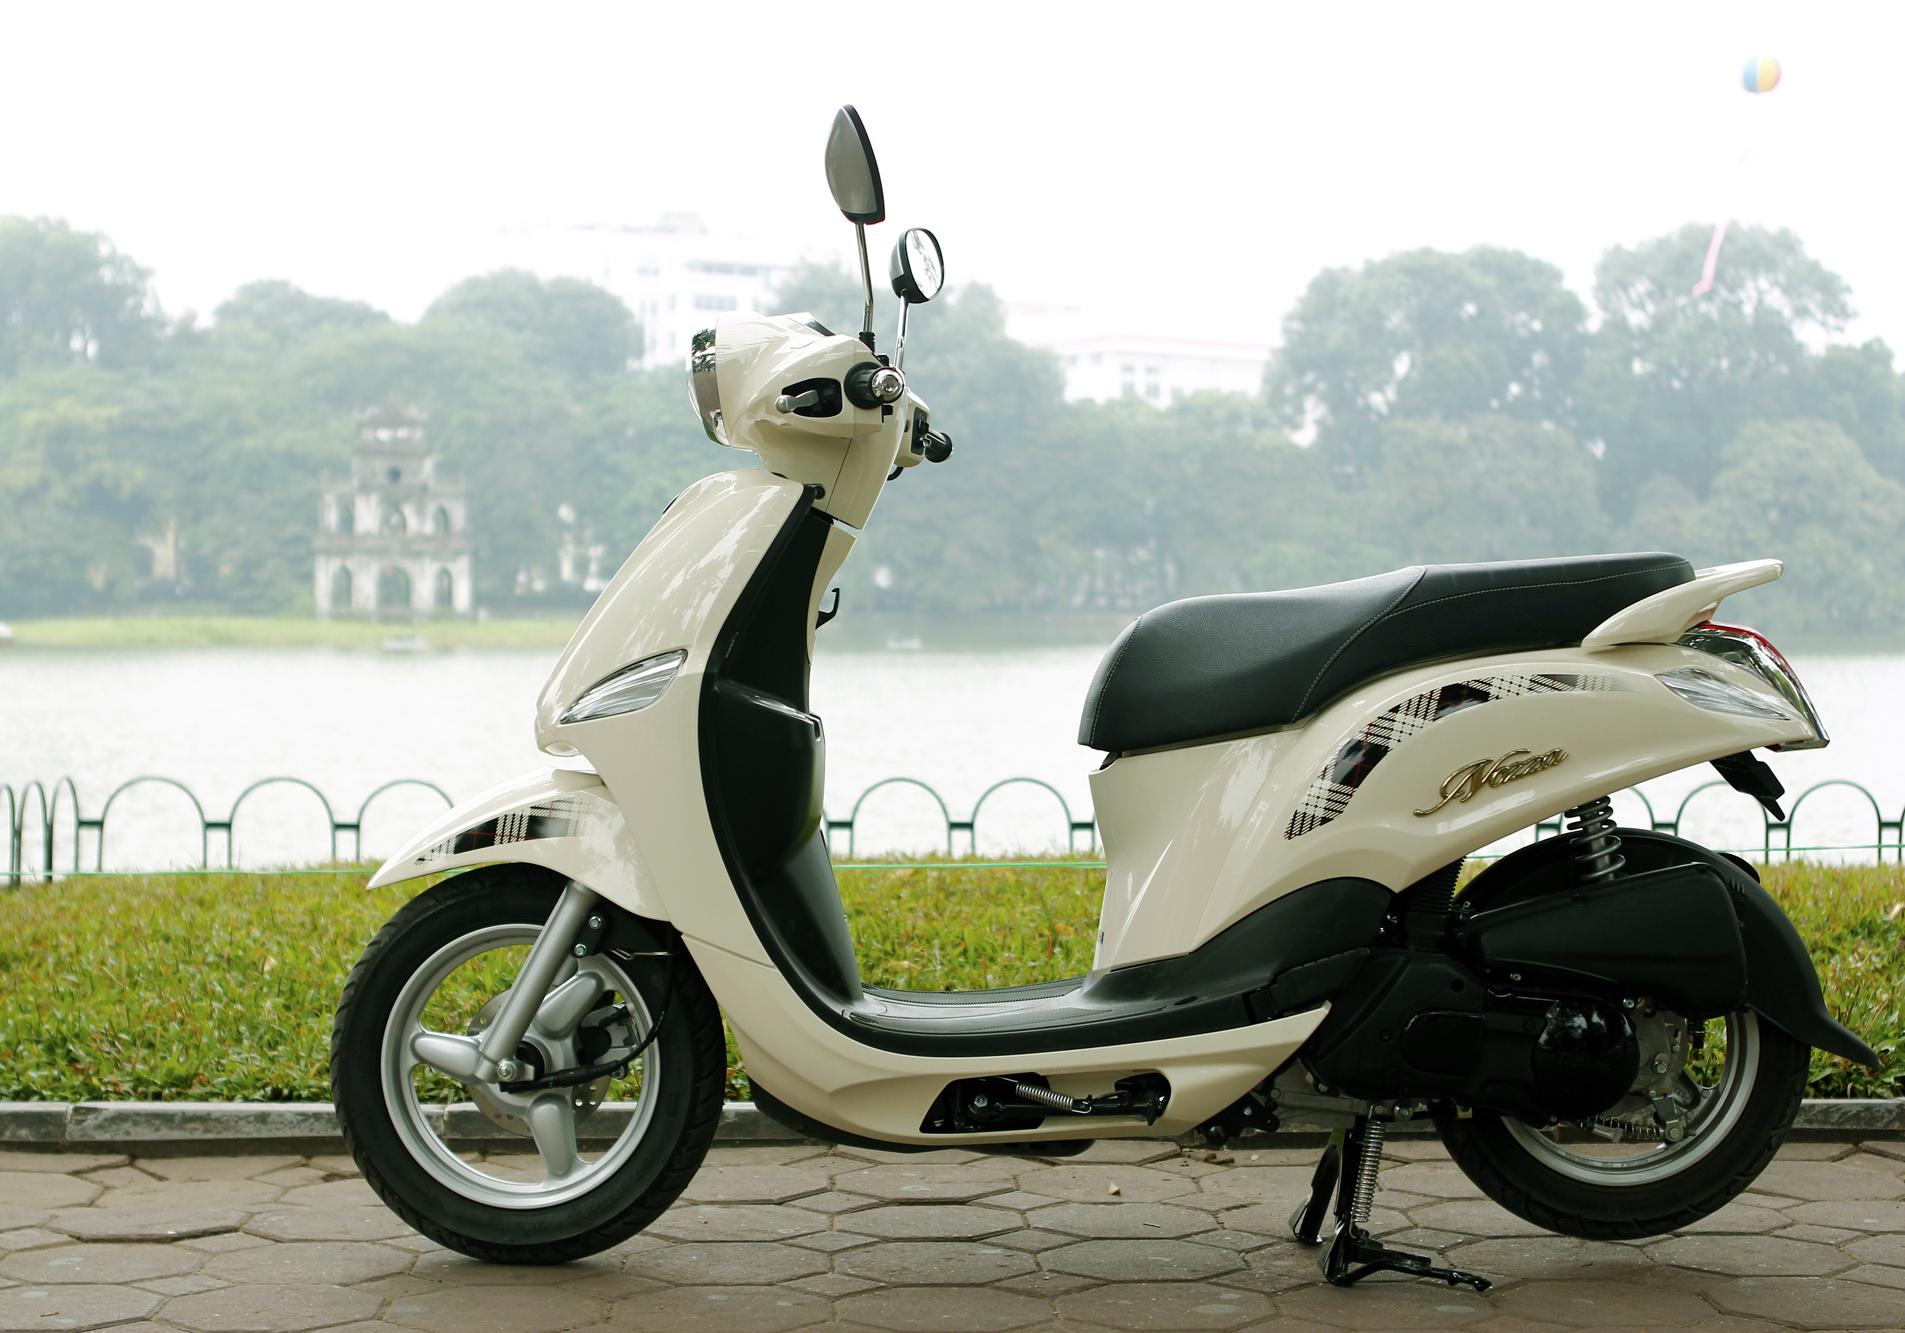 Nên chọn mua xe suzuki address honda vission hay yamaha nozza - 2